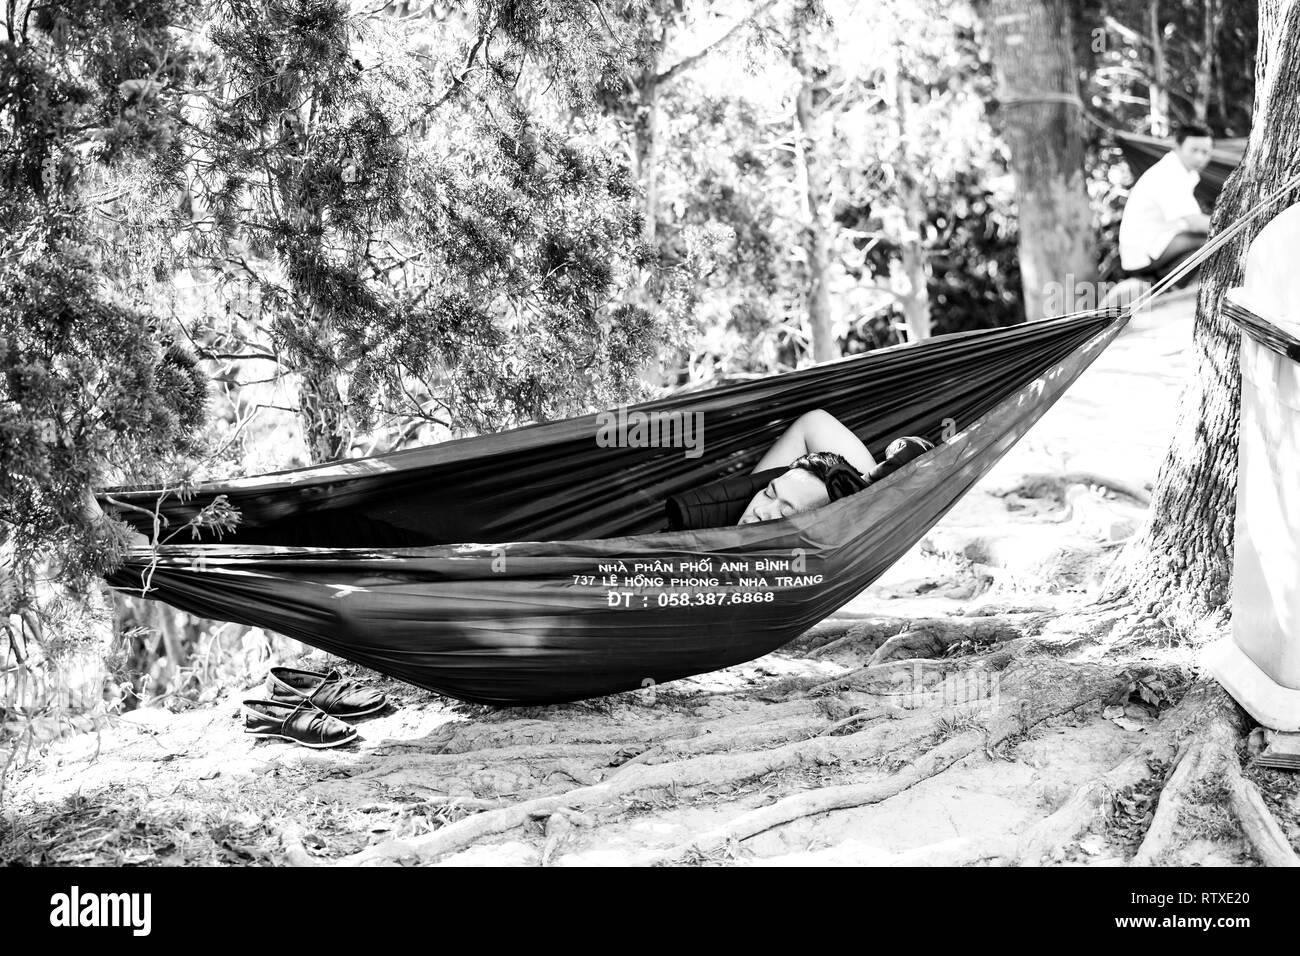 DA LAT, VIETNAM - FEBRUARY 20, 2018: Bus driver sleeps in a hammock during his lunch break in Da Lat, Vietnam - Stock Image